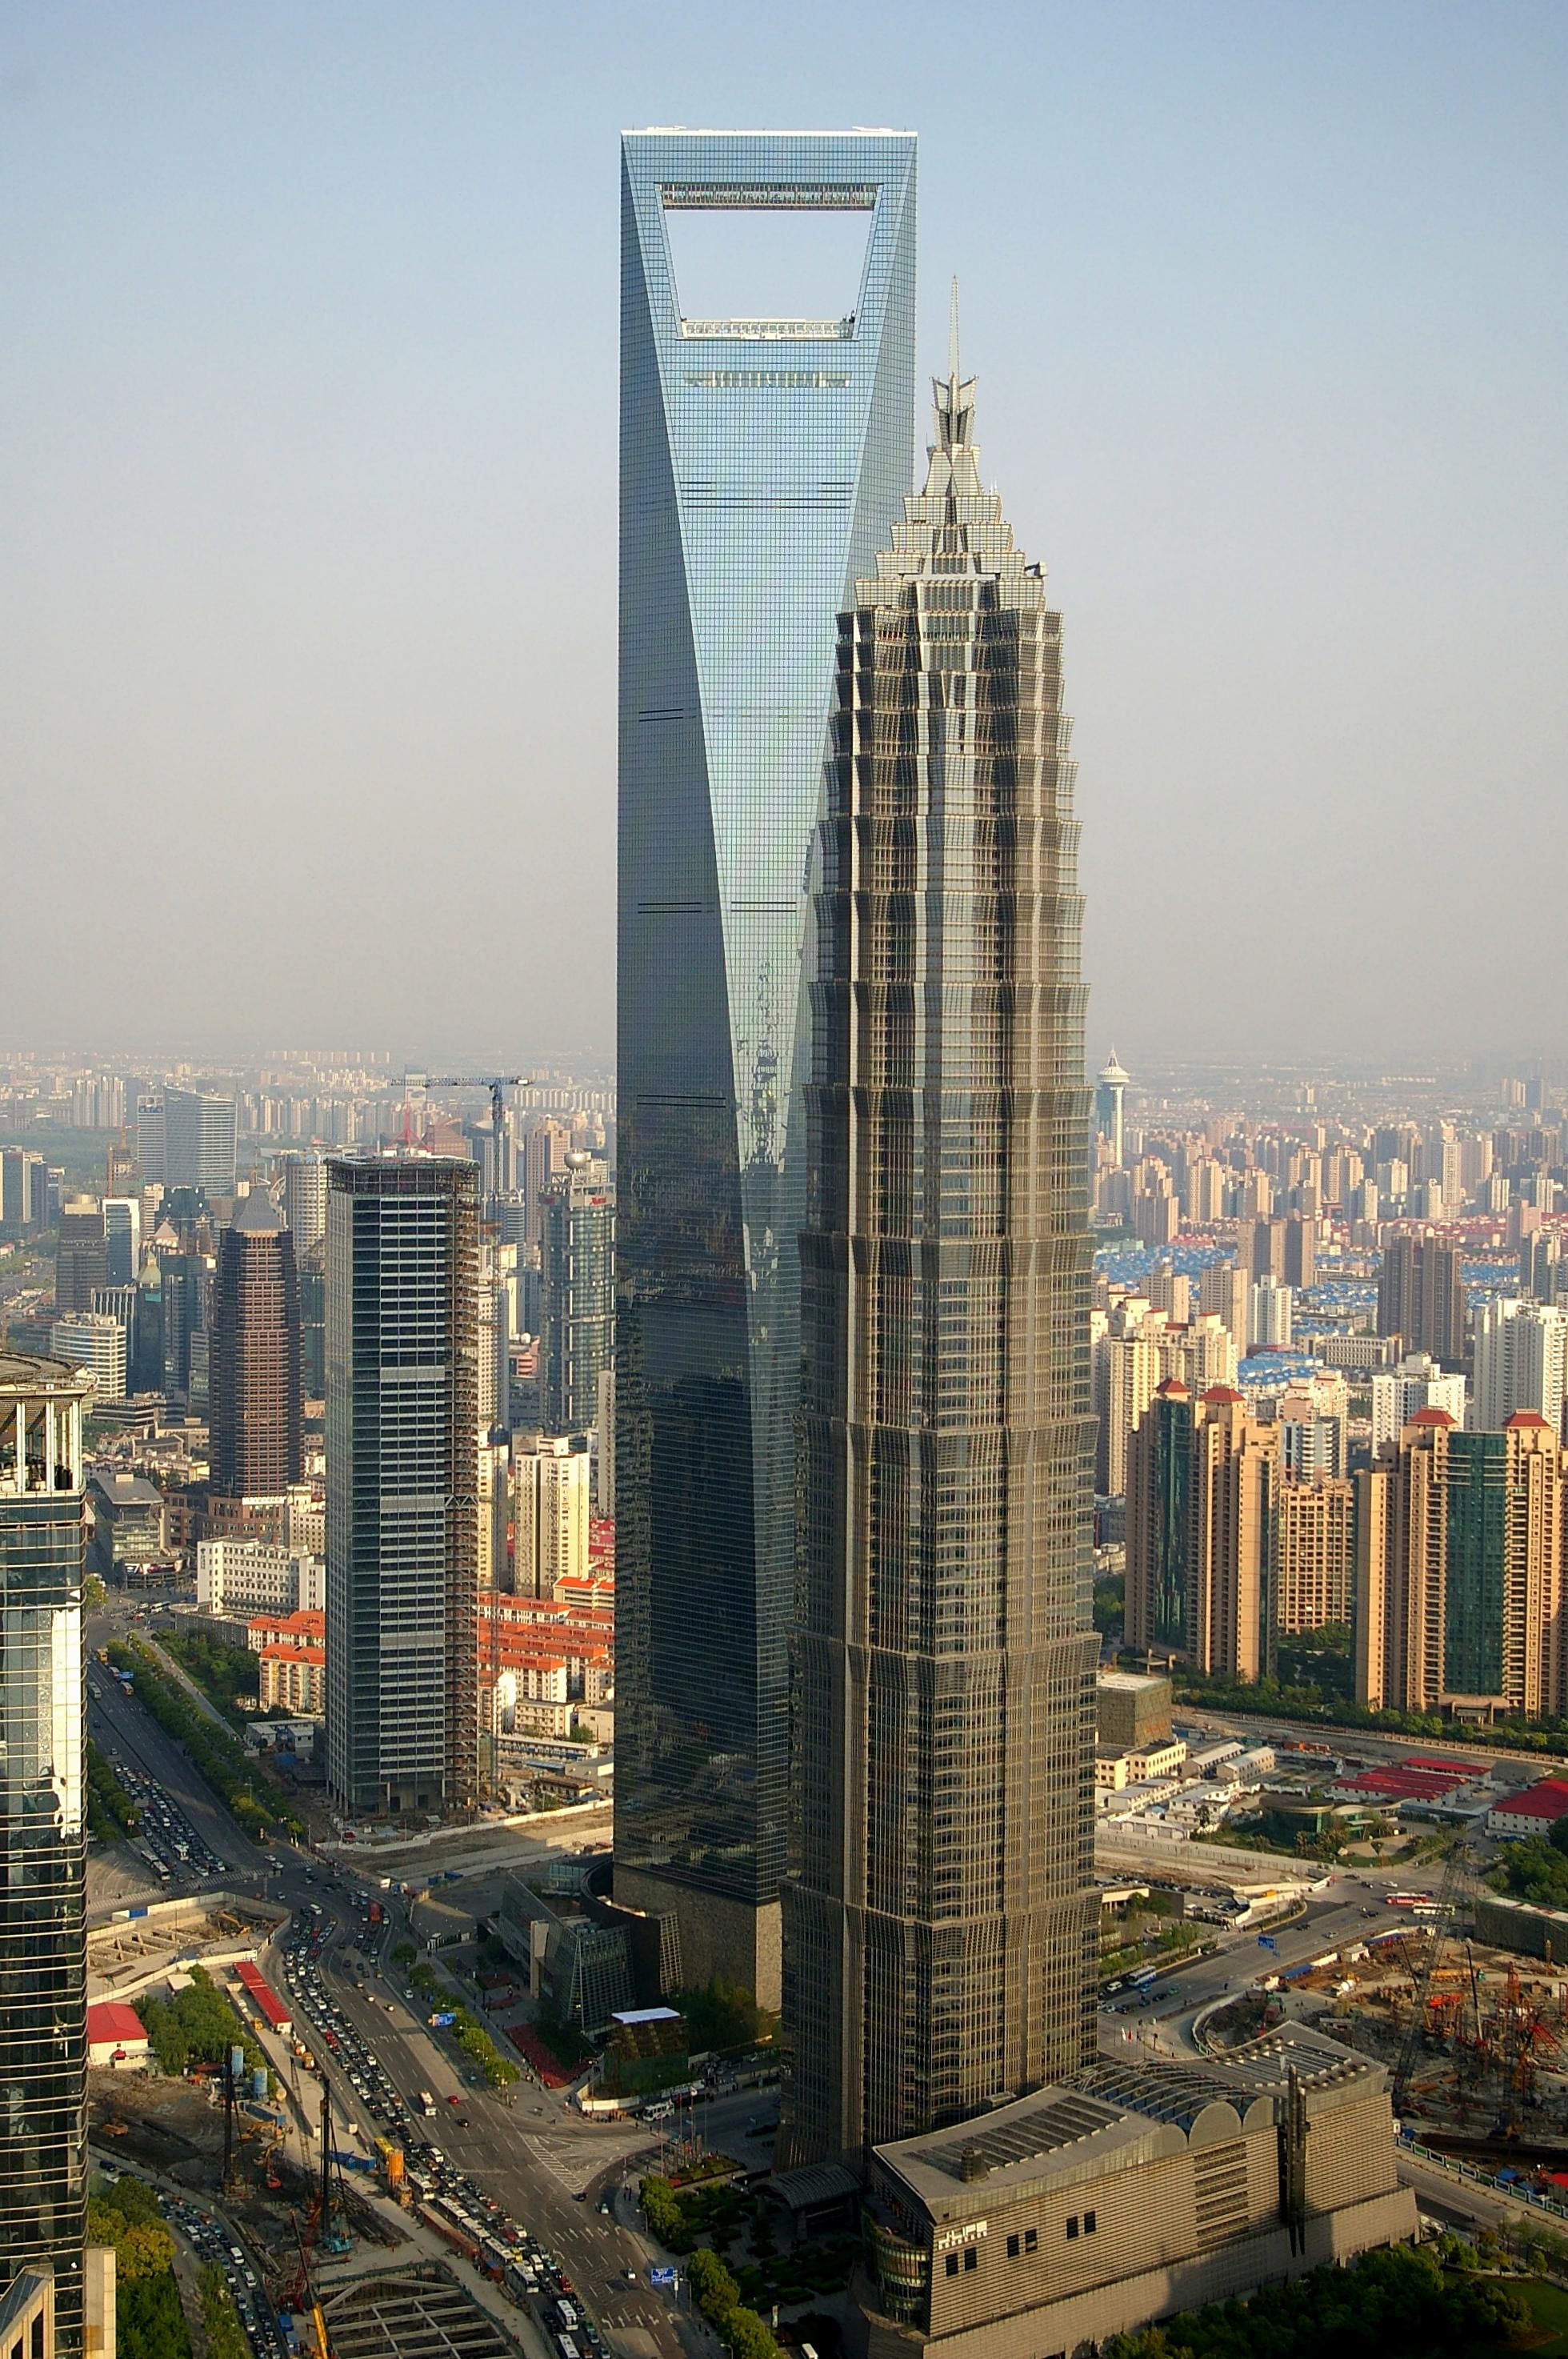 Plik:20090426 5223 Shanghai JinMao SWFC.jpg – Wikipedia ...